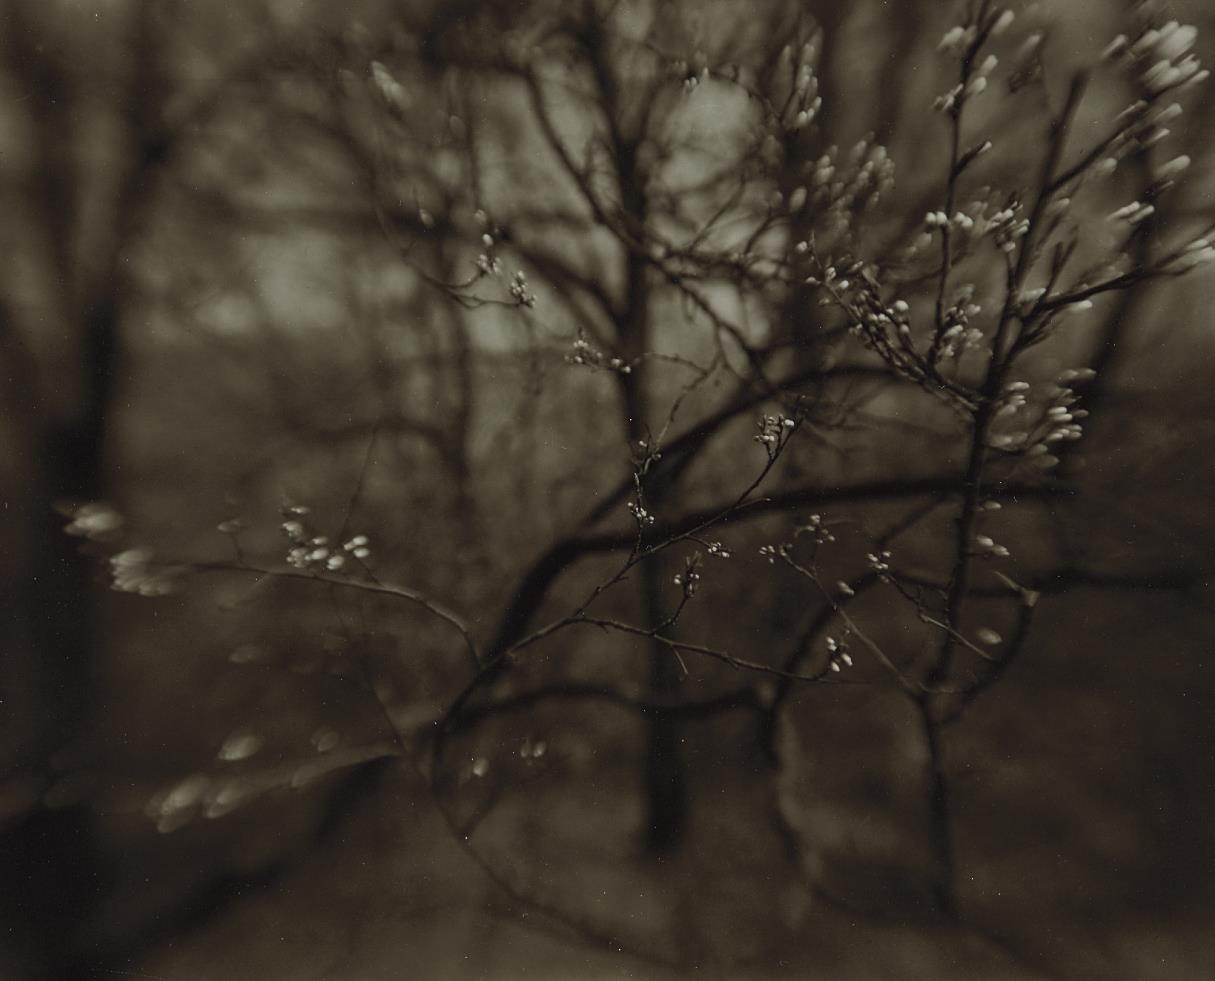 Josef Sudek-The Coming of Spring-1968